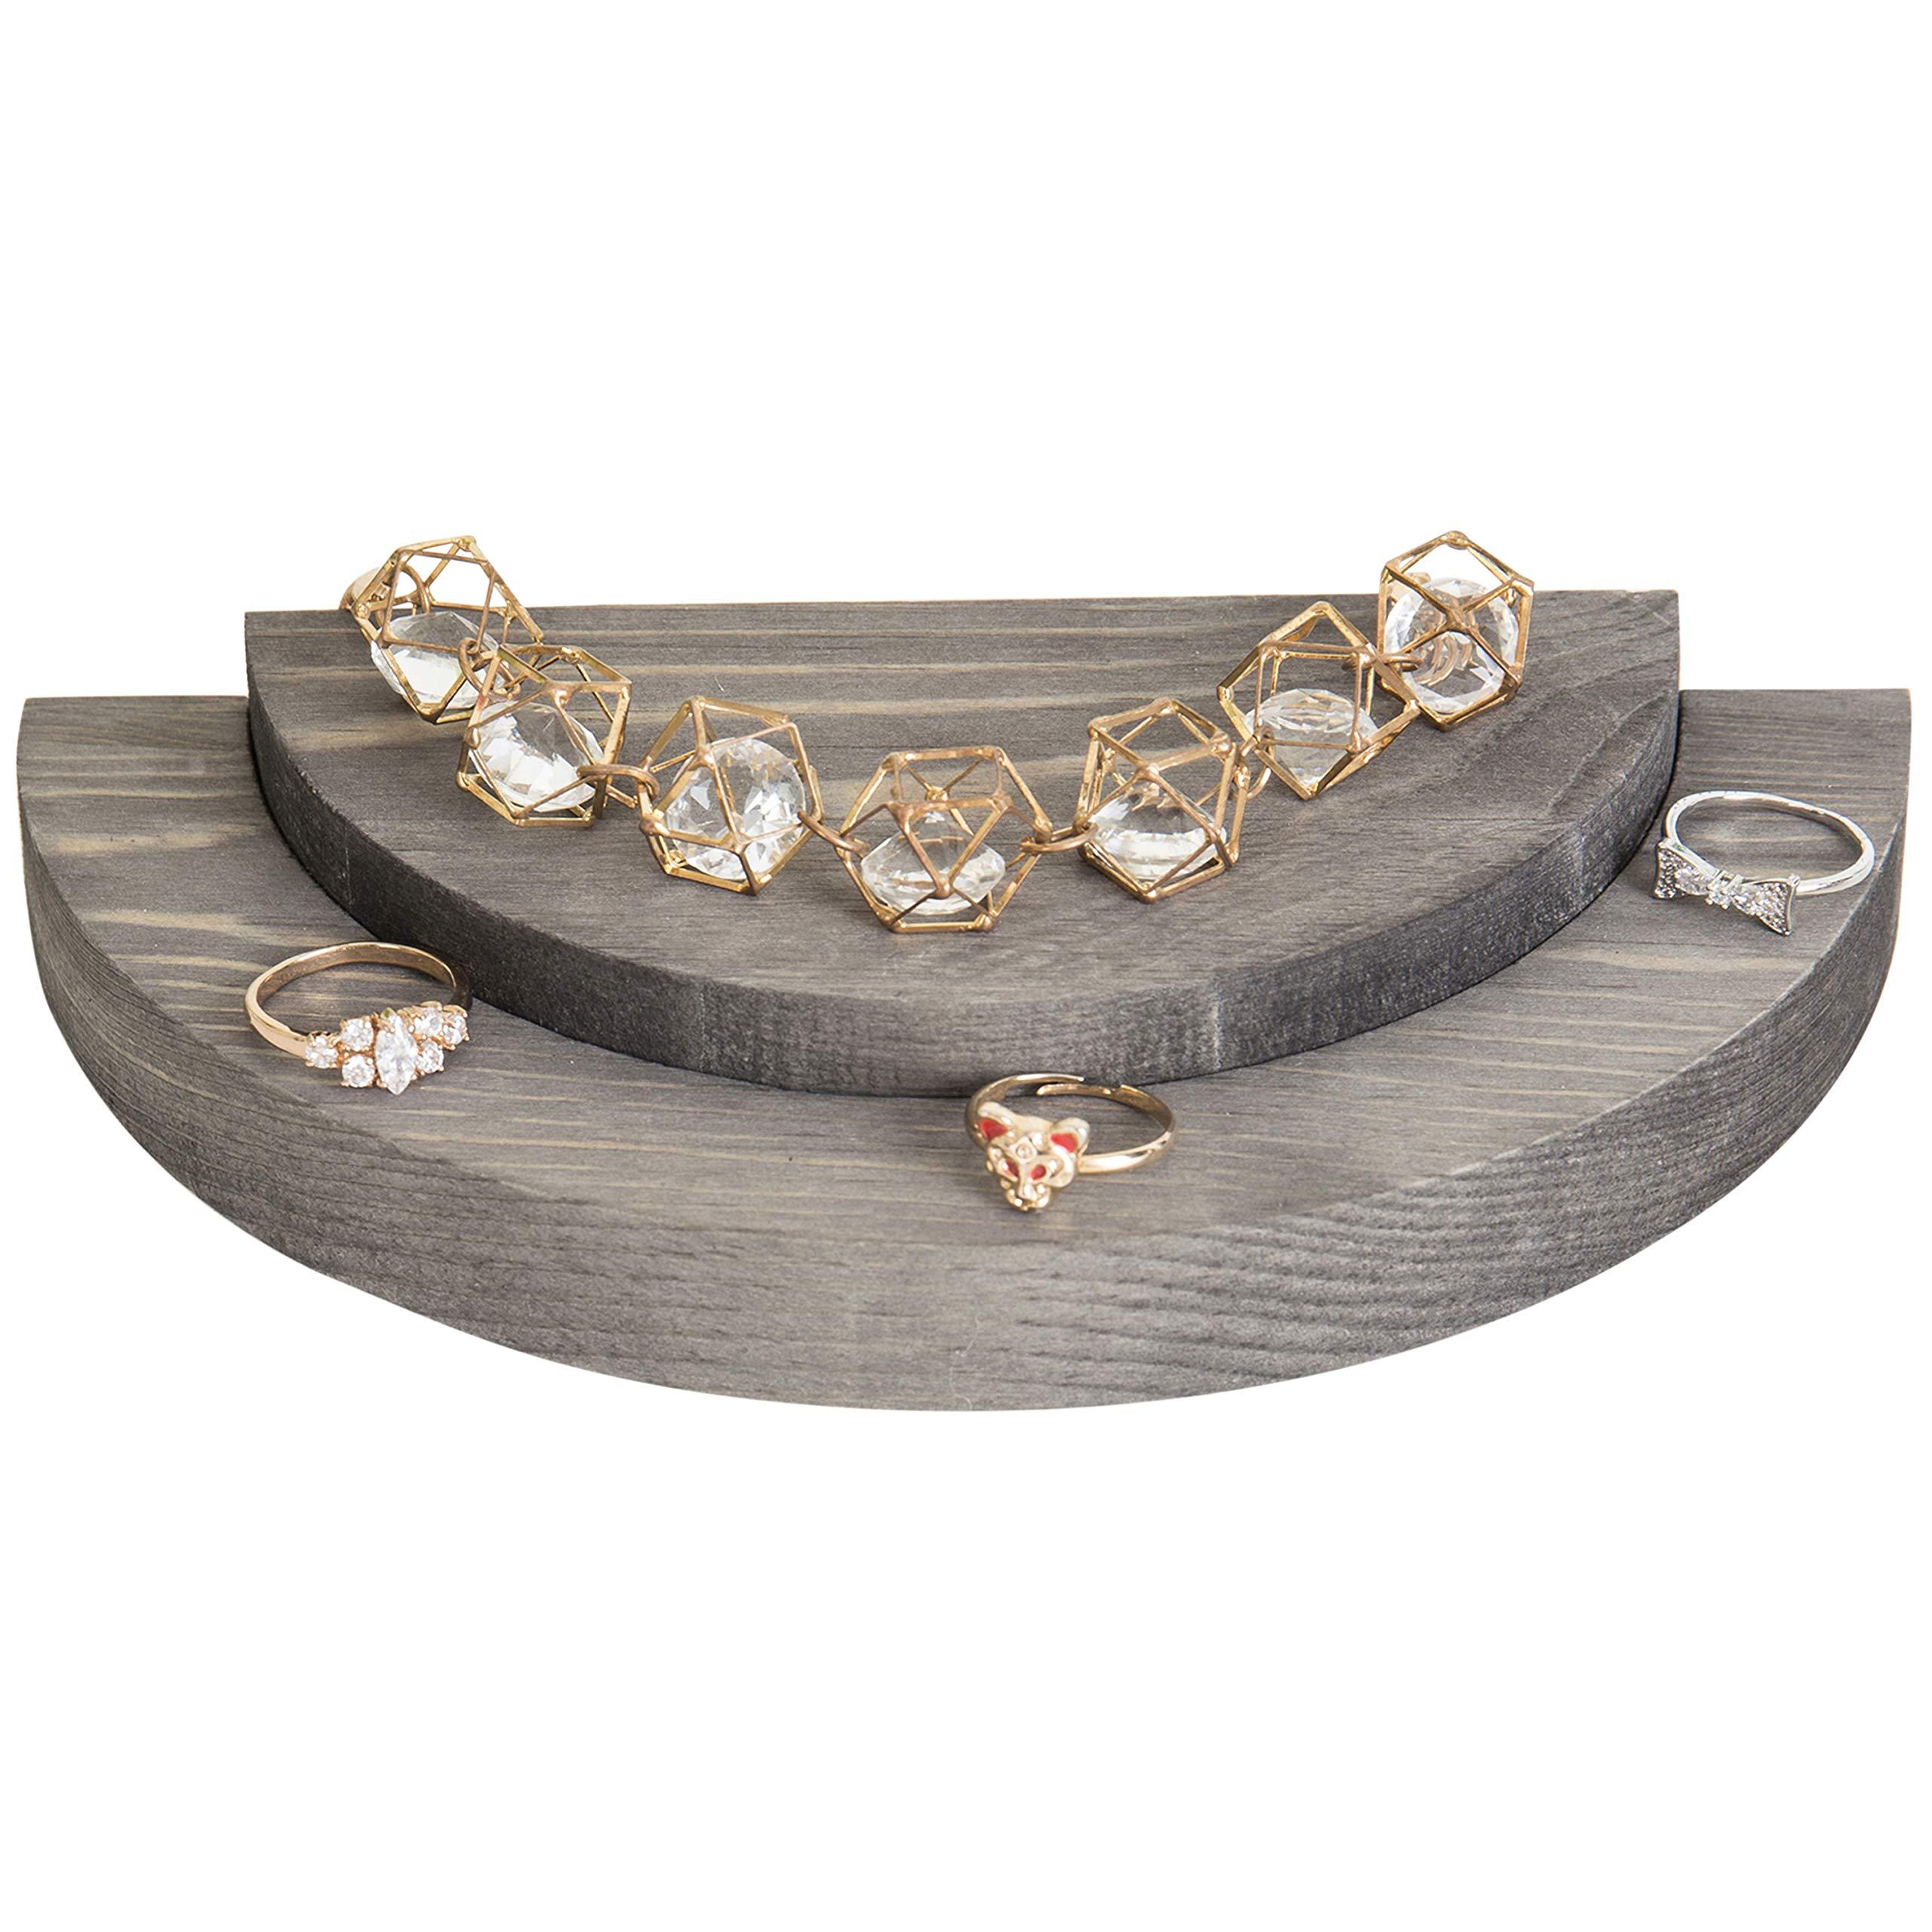 MyGift Rustic Gray Wood Semicircle Jewelry Display Board